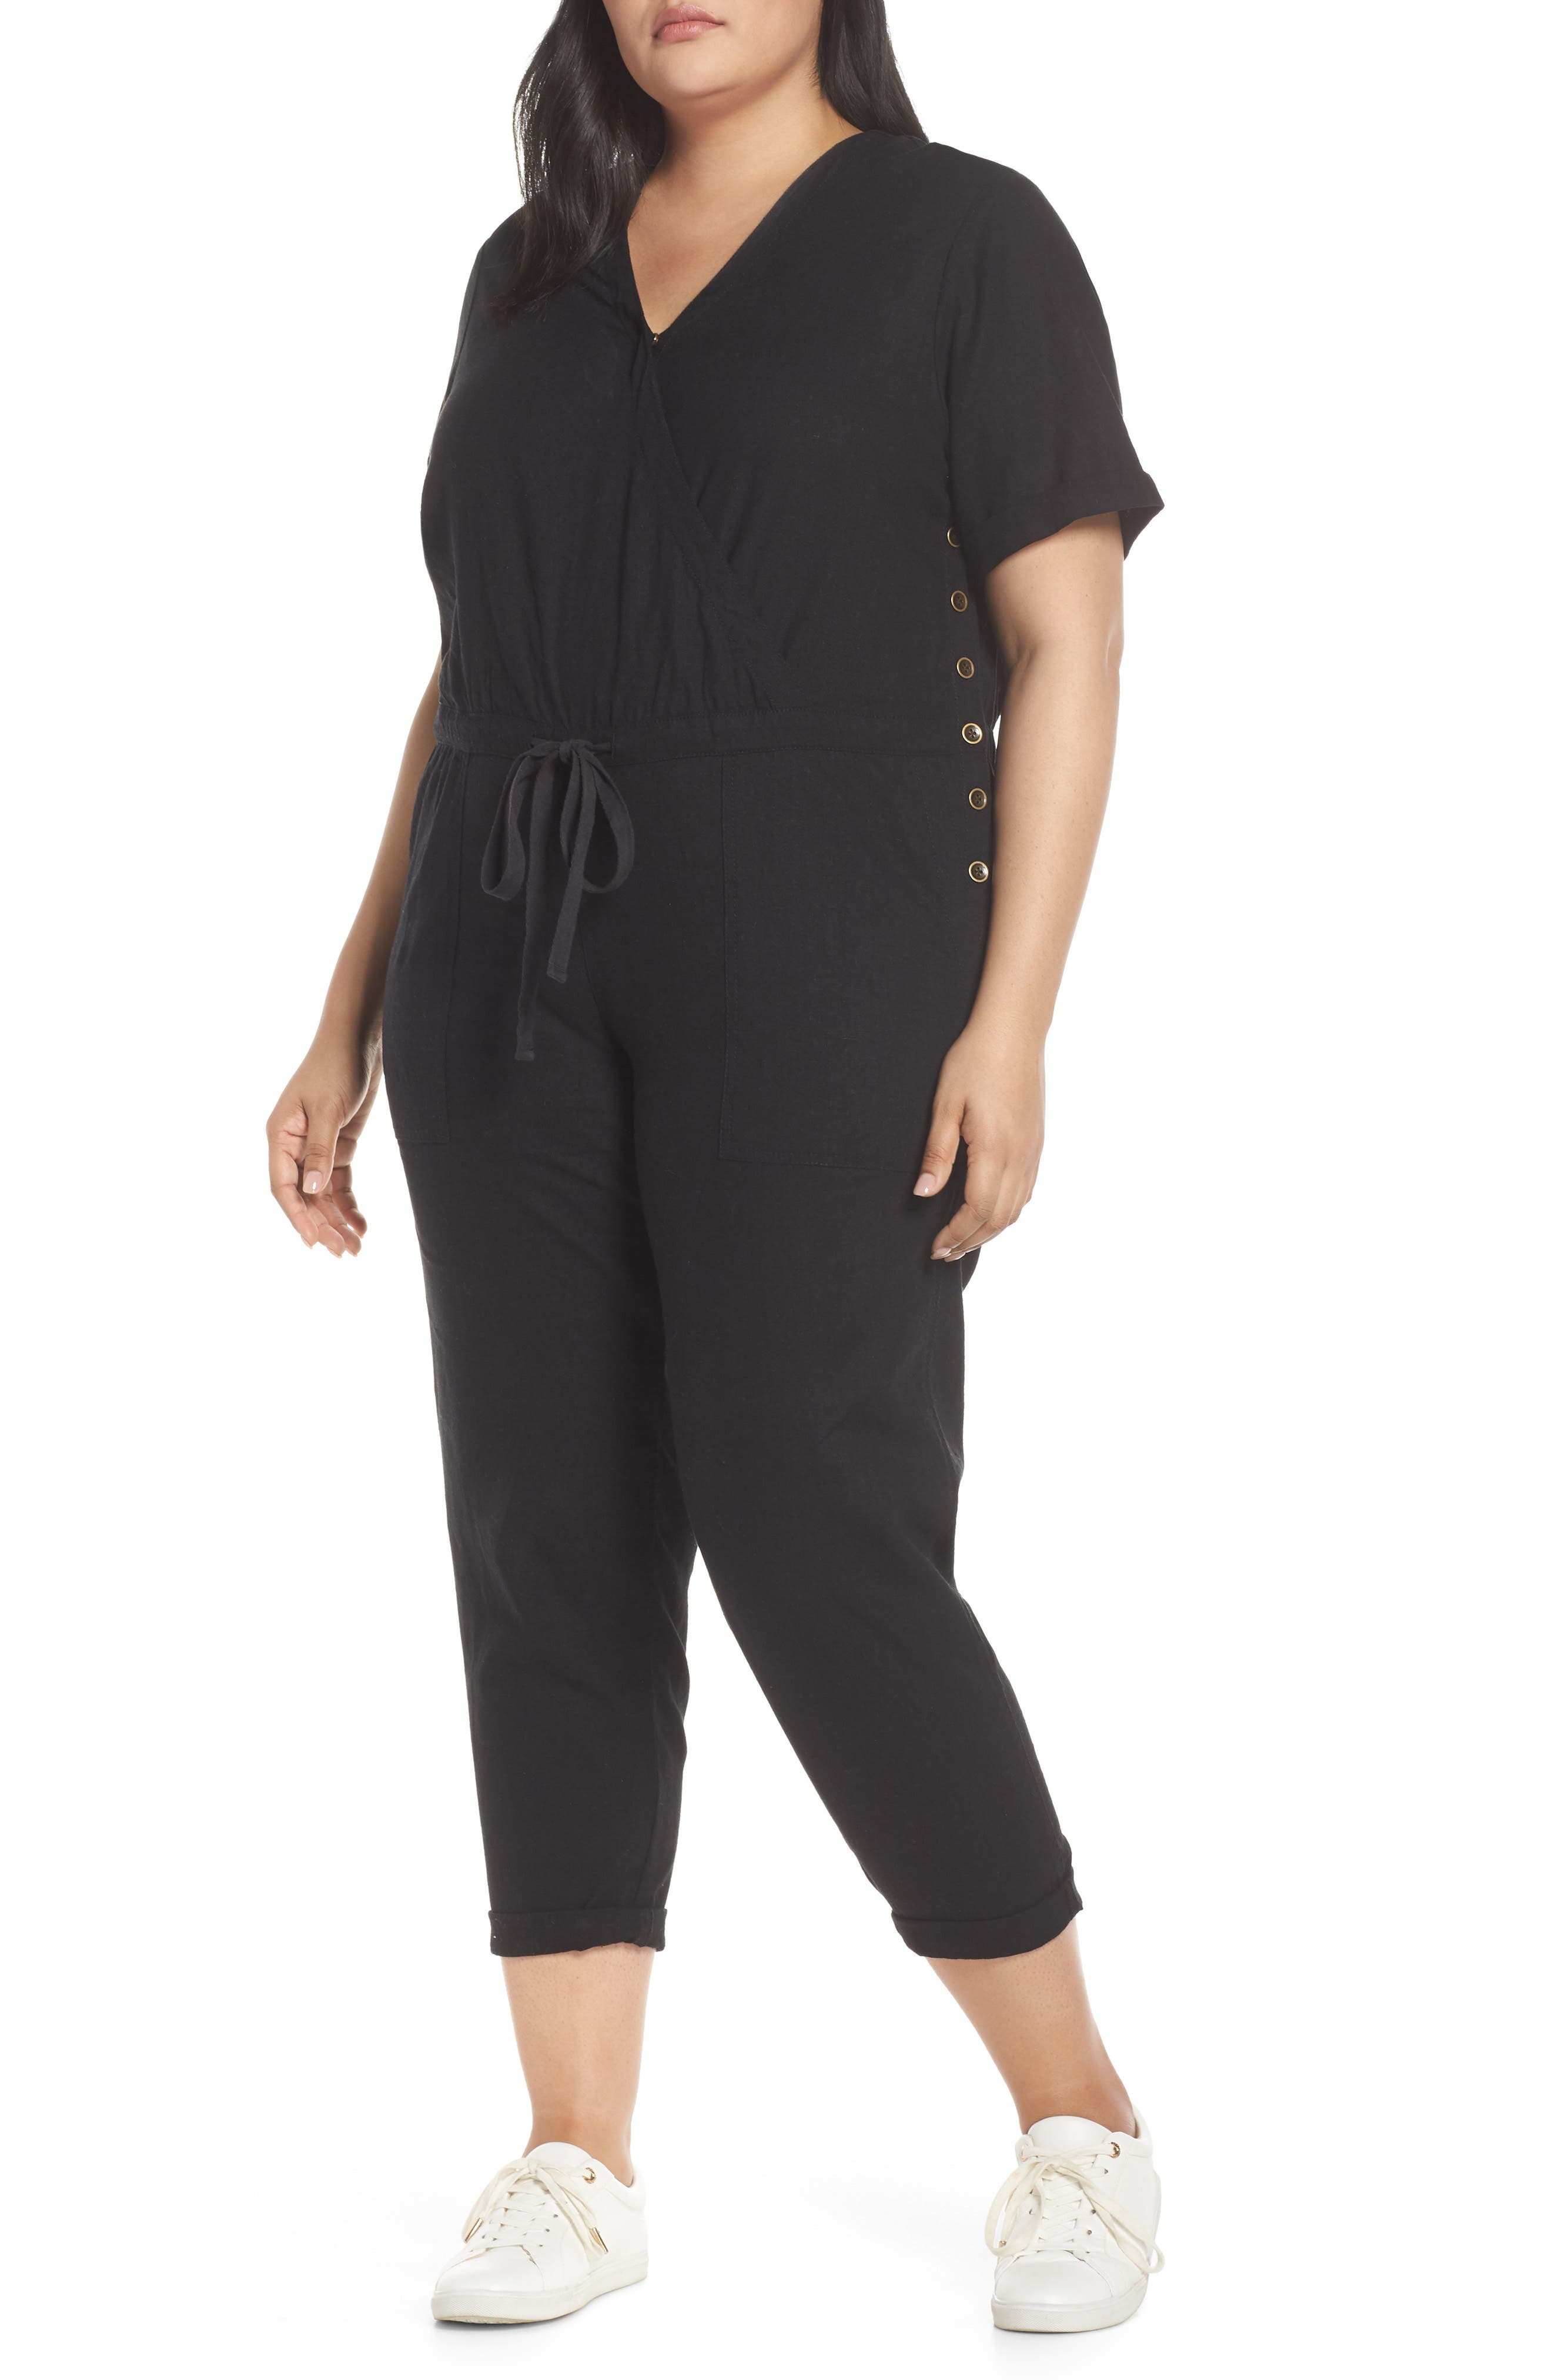 1d1689a7508e Rompers   Jumpsuits Caslon® for Women  Clothing